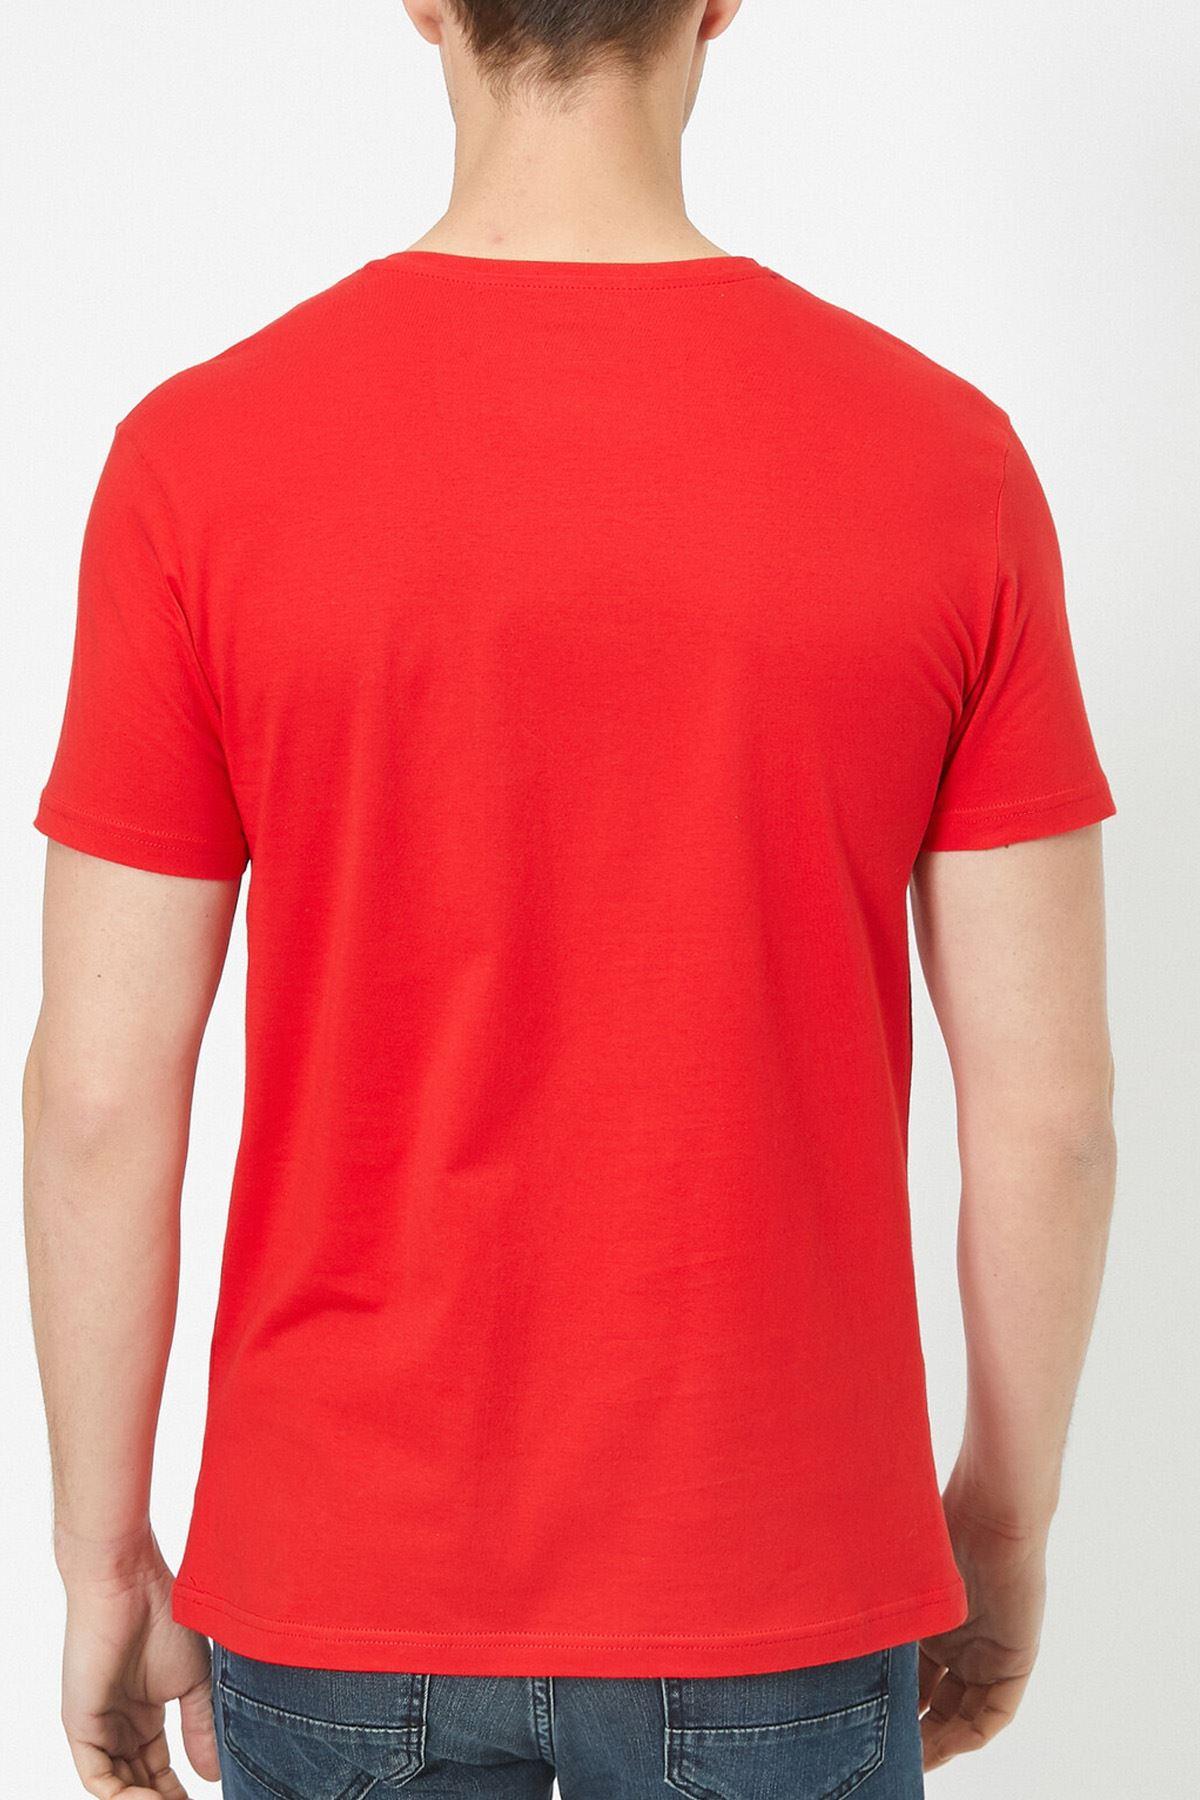 Anime Death Note Kırmızı Erkek Tshirt - Tişört